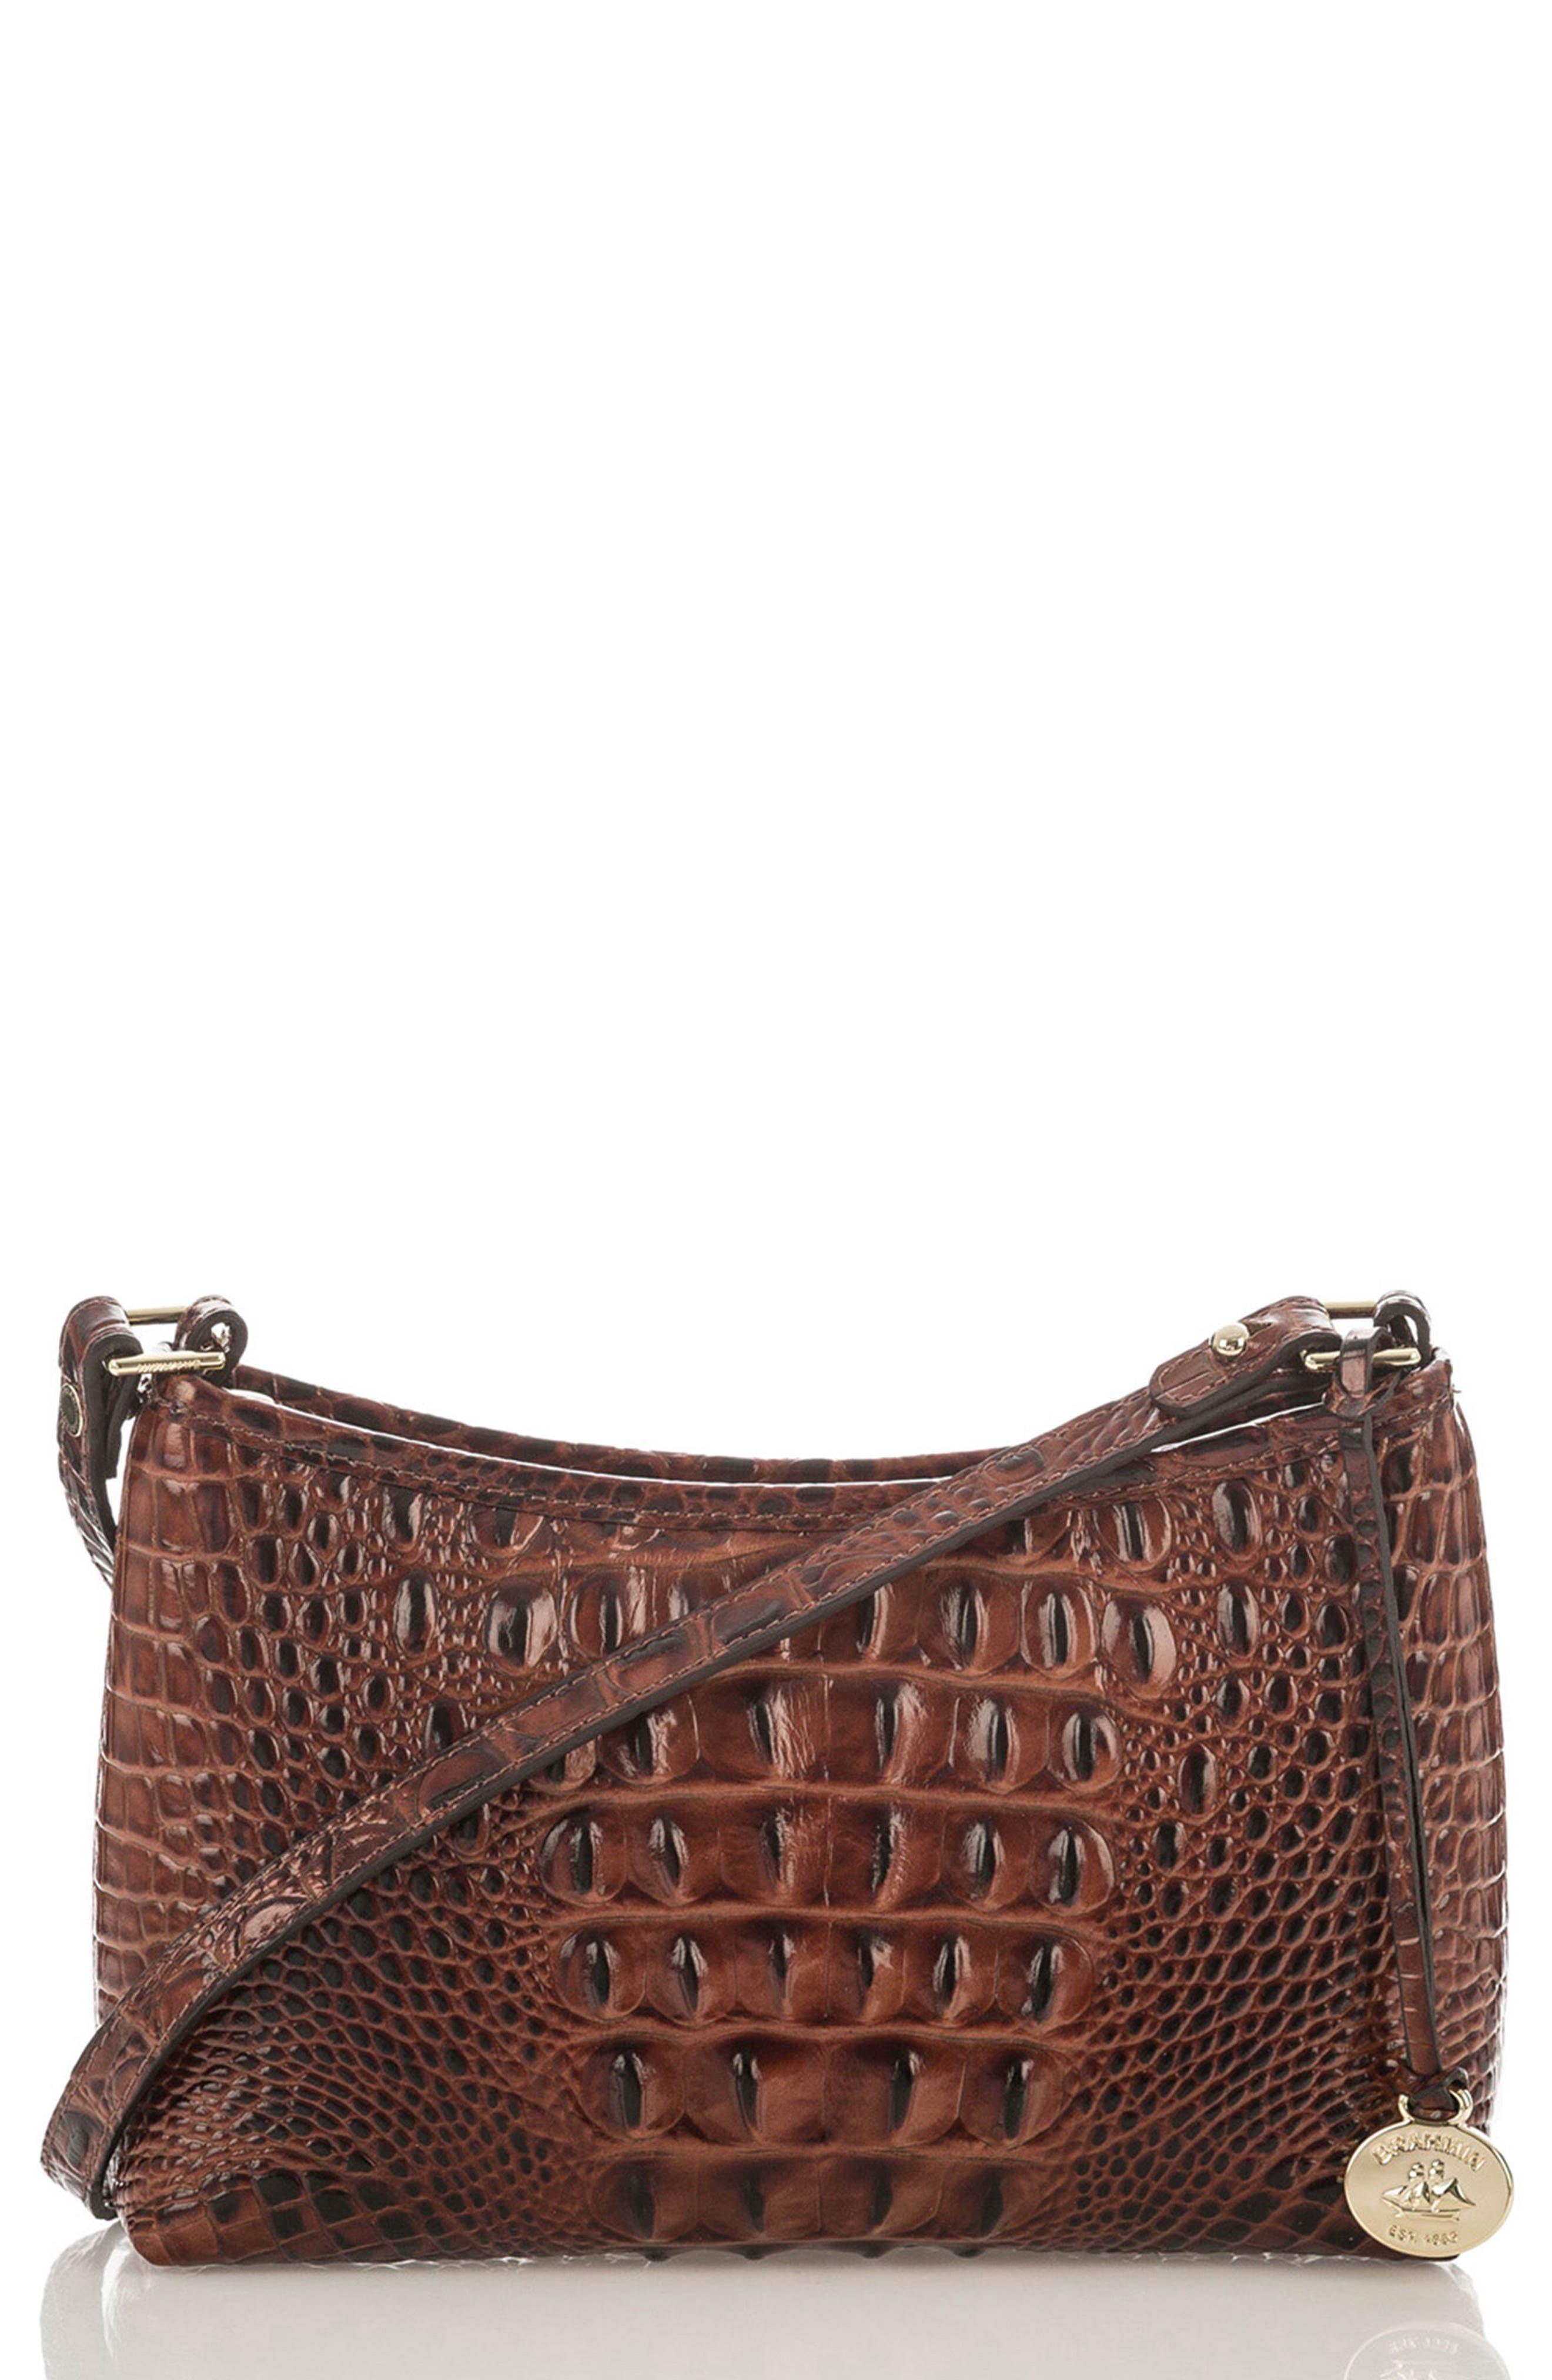 'Anytime - Mini' Convertible Handbag,                             Alternate thumbnail 25, color,